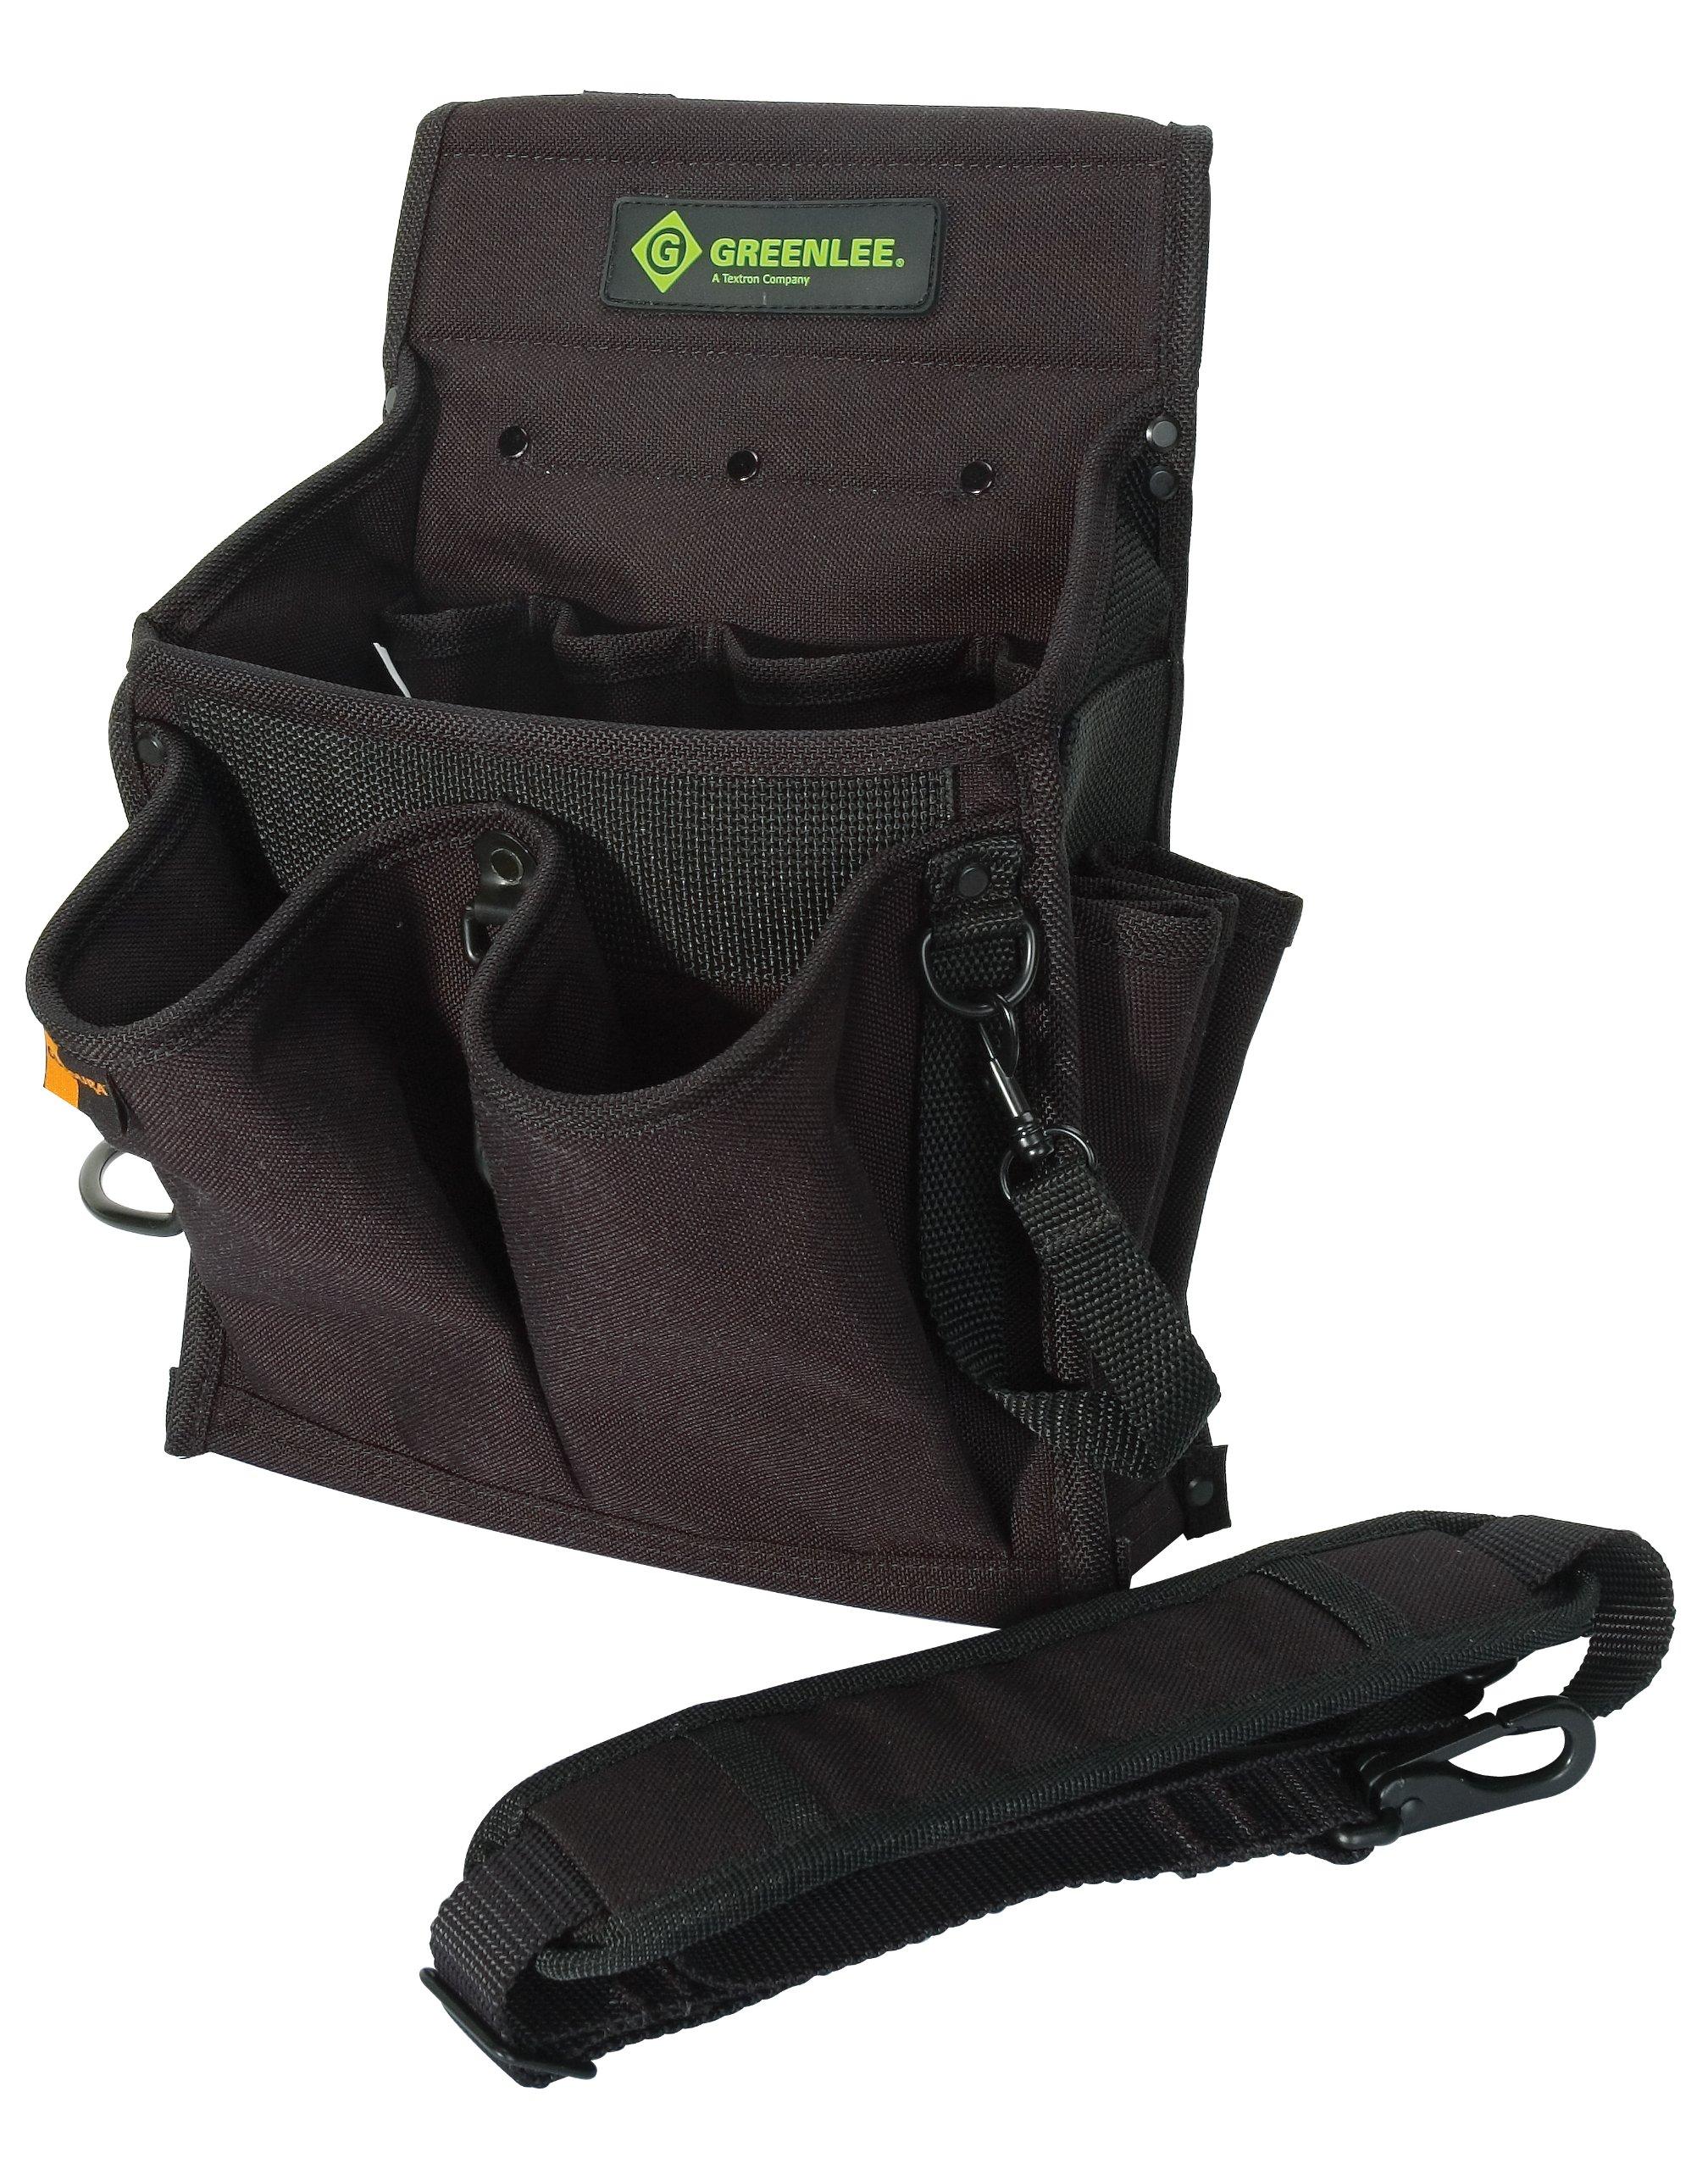 Greenlee 0158-15 Tool Caddy, 20 Pocket